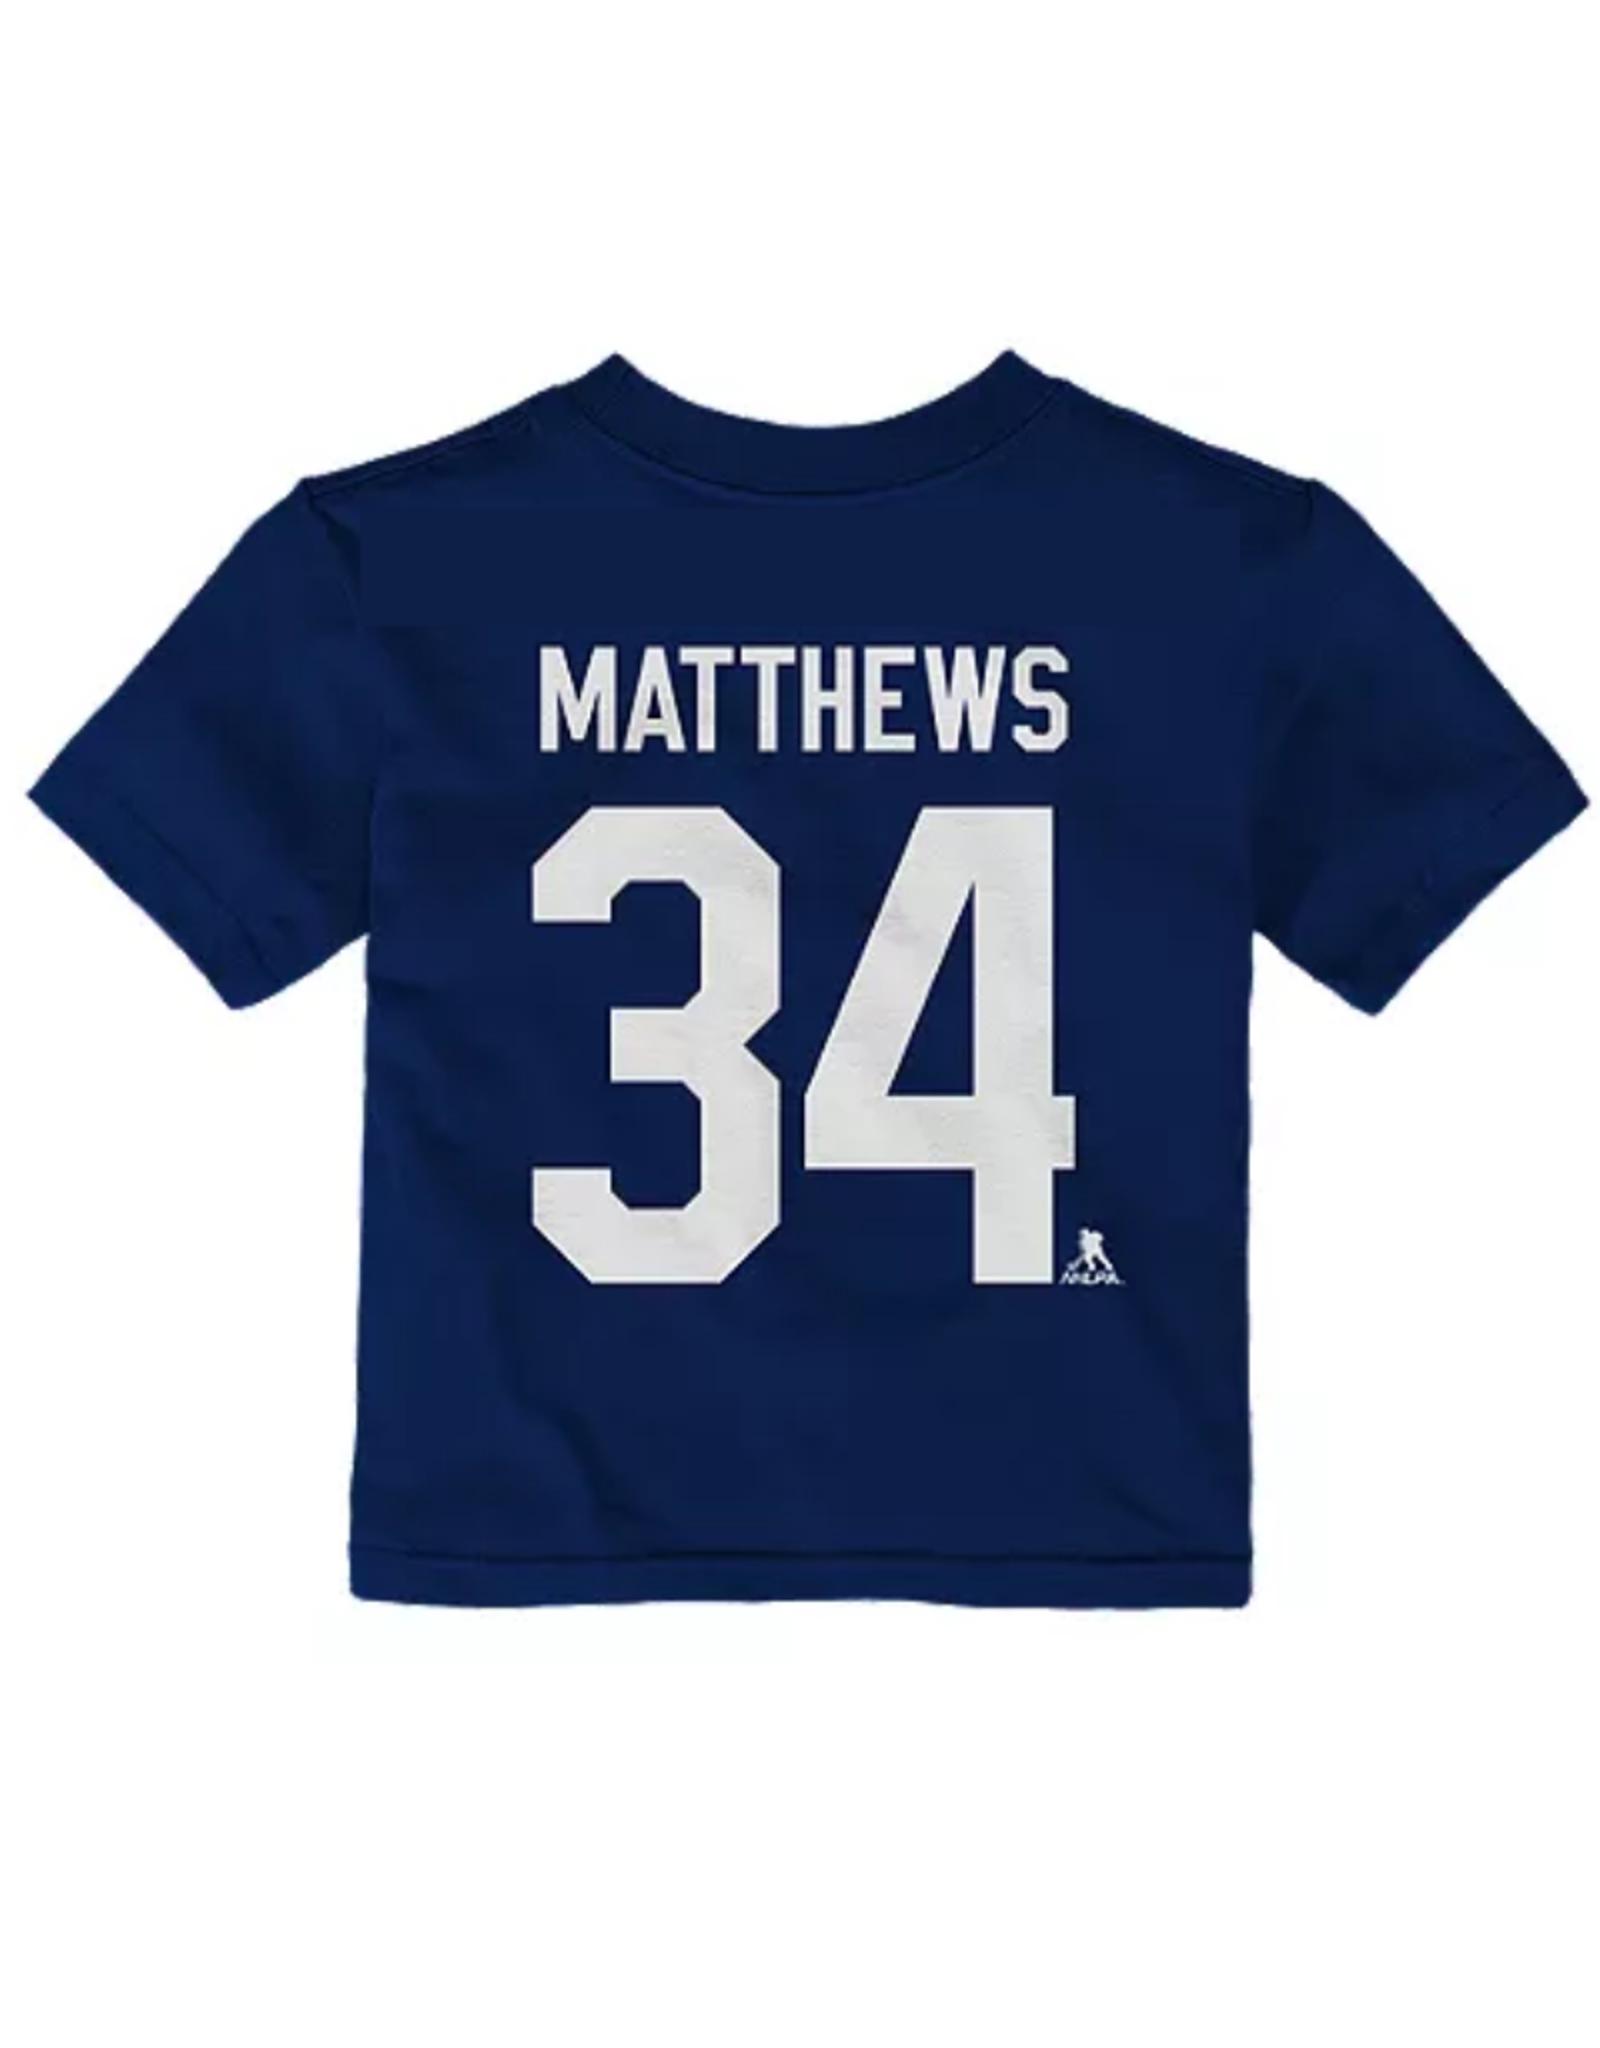 NHL Child's Matthews #34 T-Shirt Toronto Maple Leafs